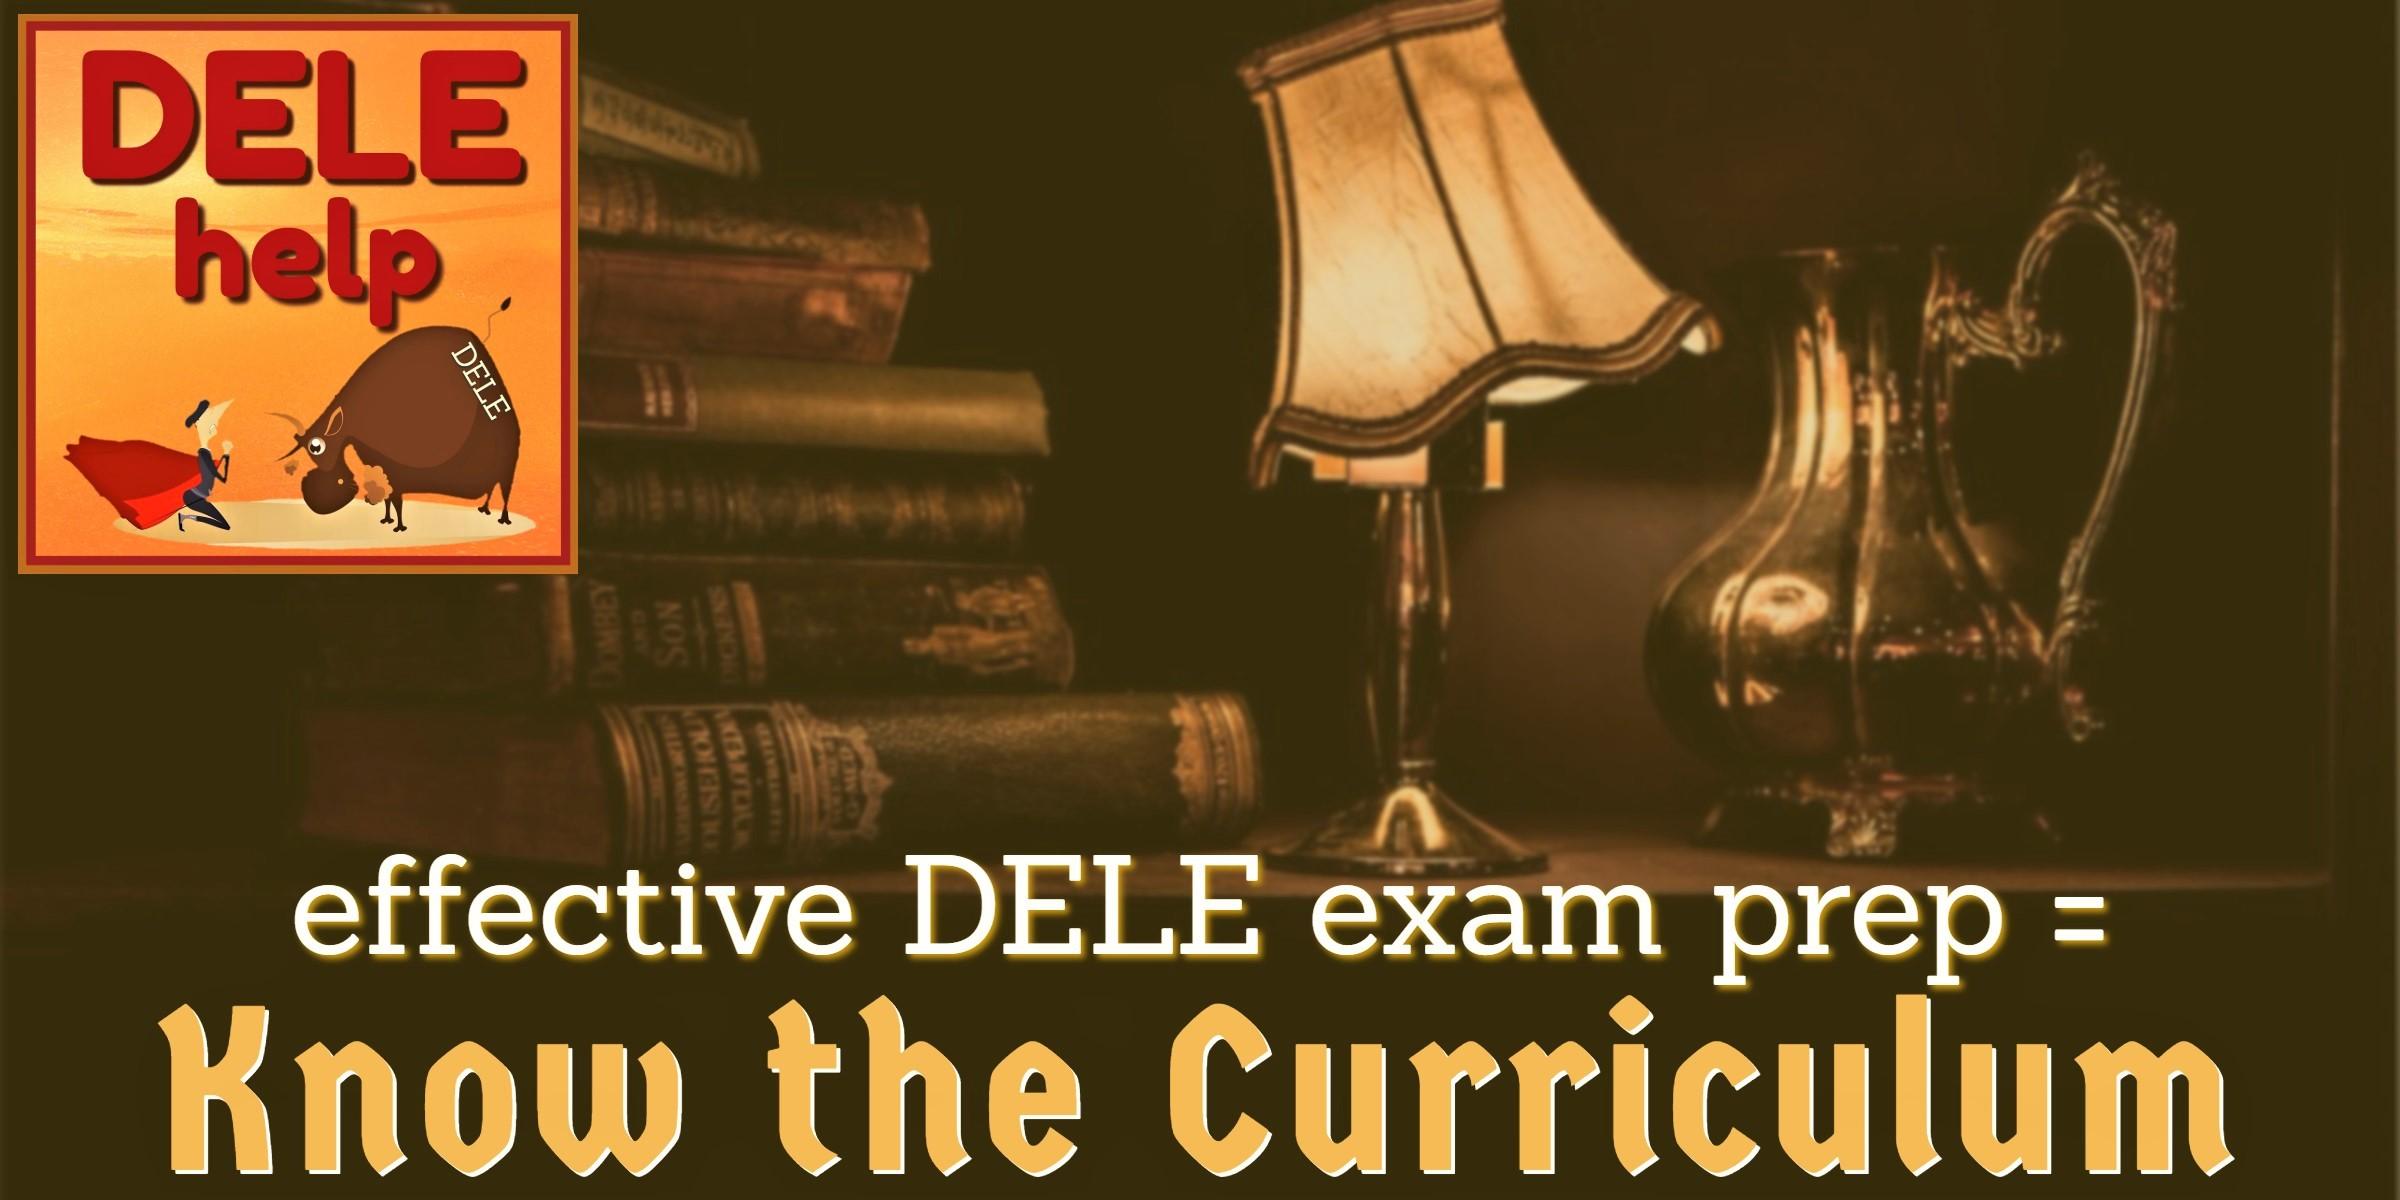 Focus your DELE / SIELE / OPI exam prep